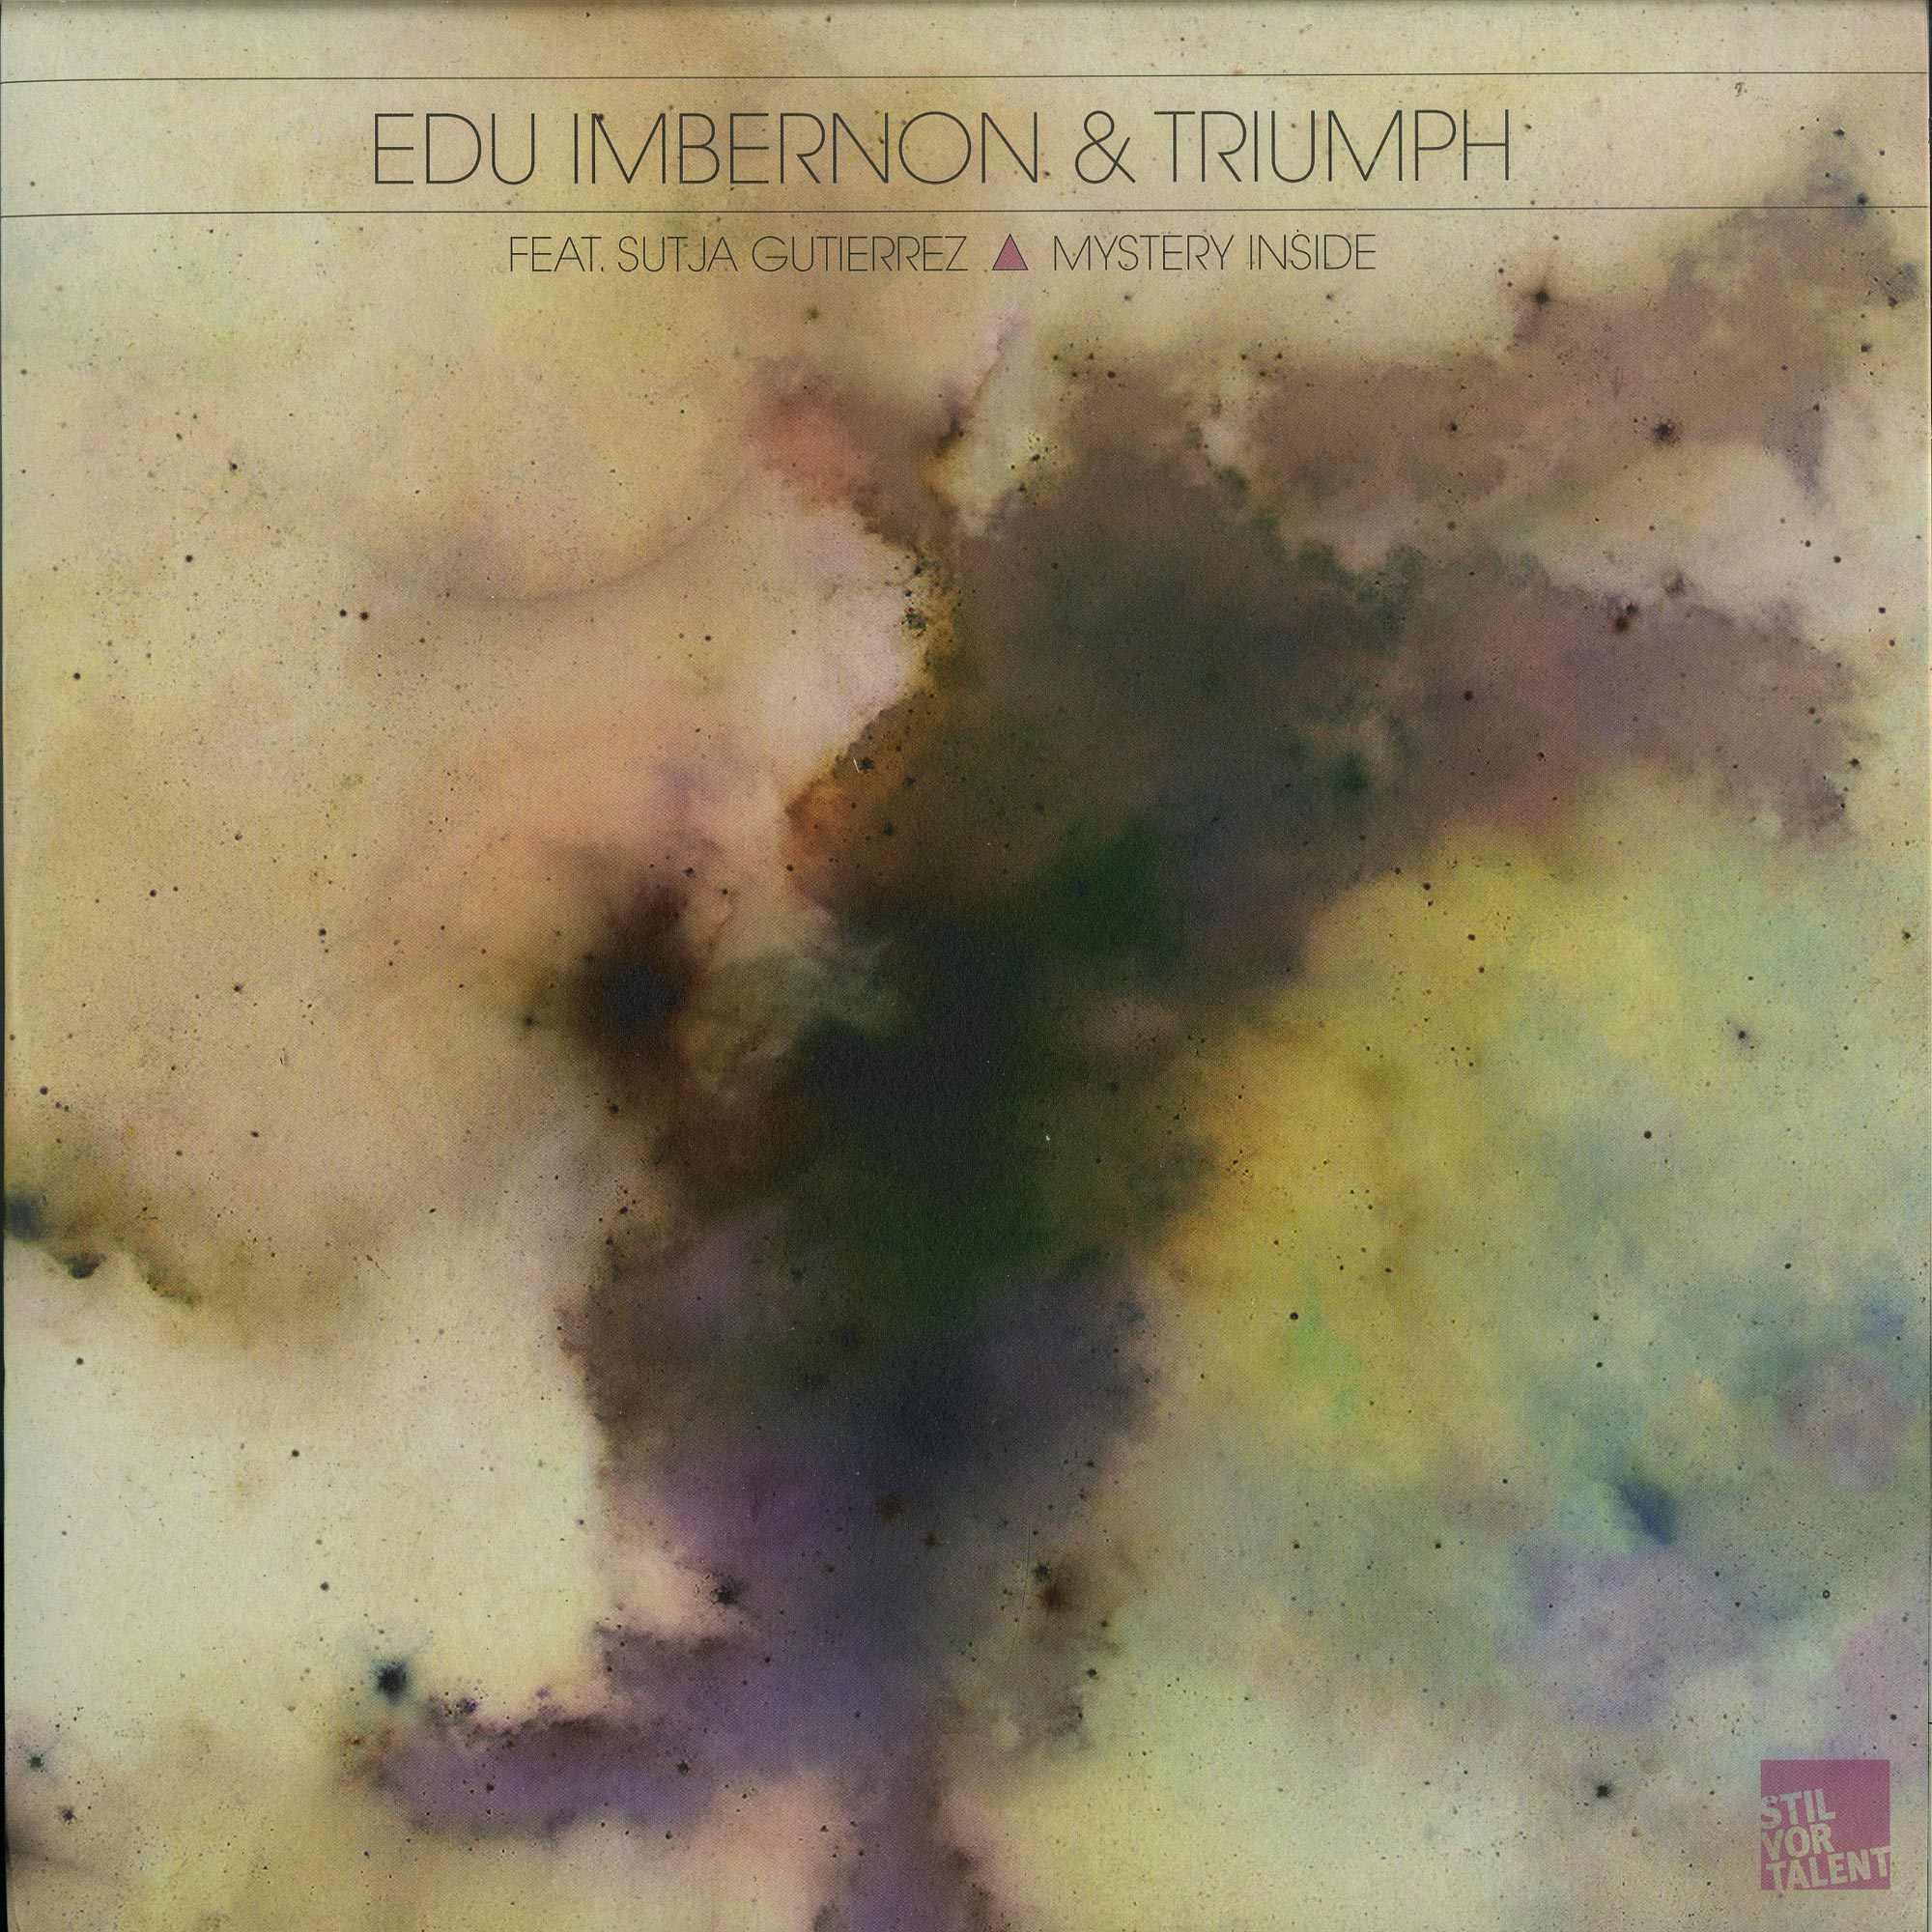 Edu Imbernon & Triumph feat Sutja Gutier - INK